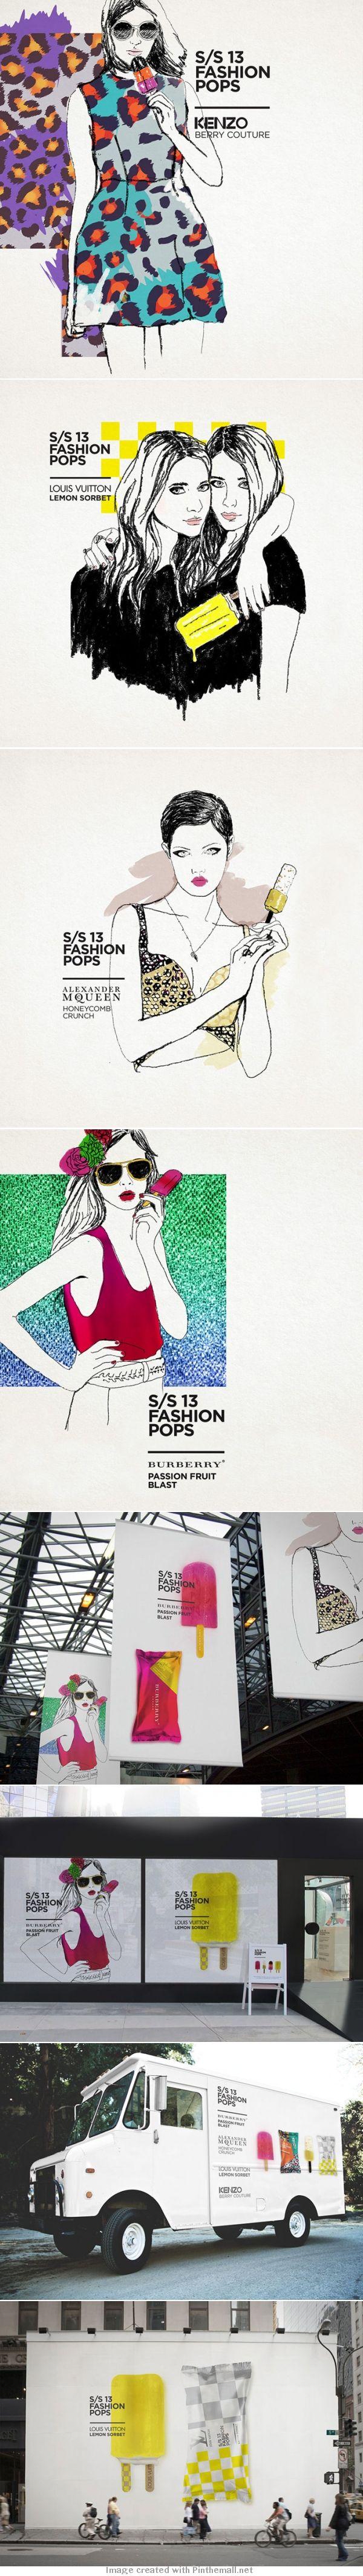 Spring Summer 13 Fashion Pops